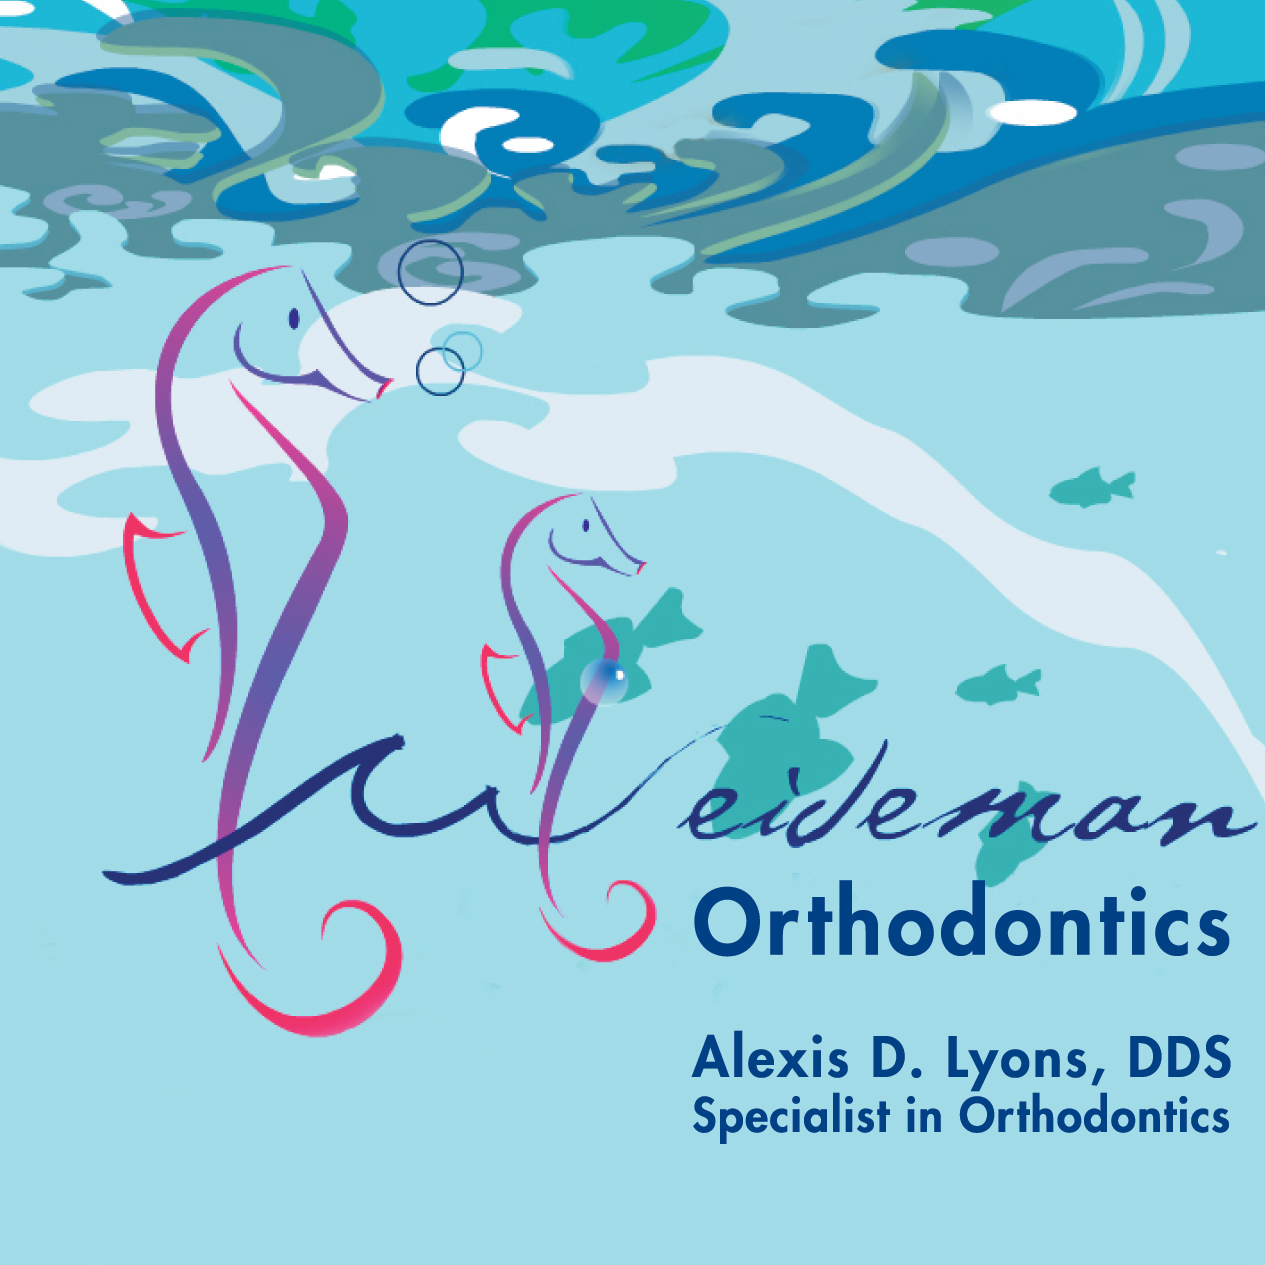 Weideman Orthodontics